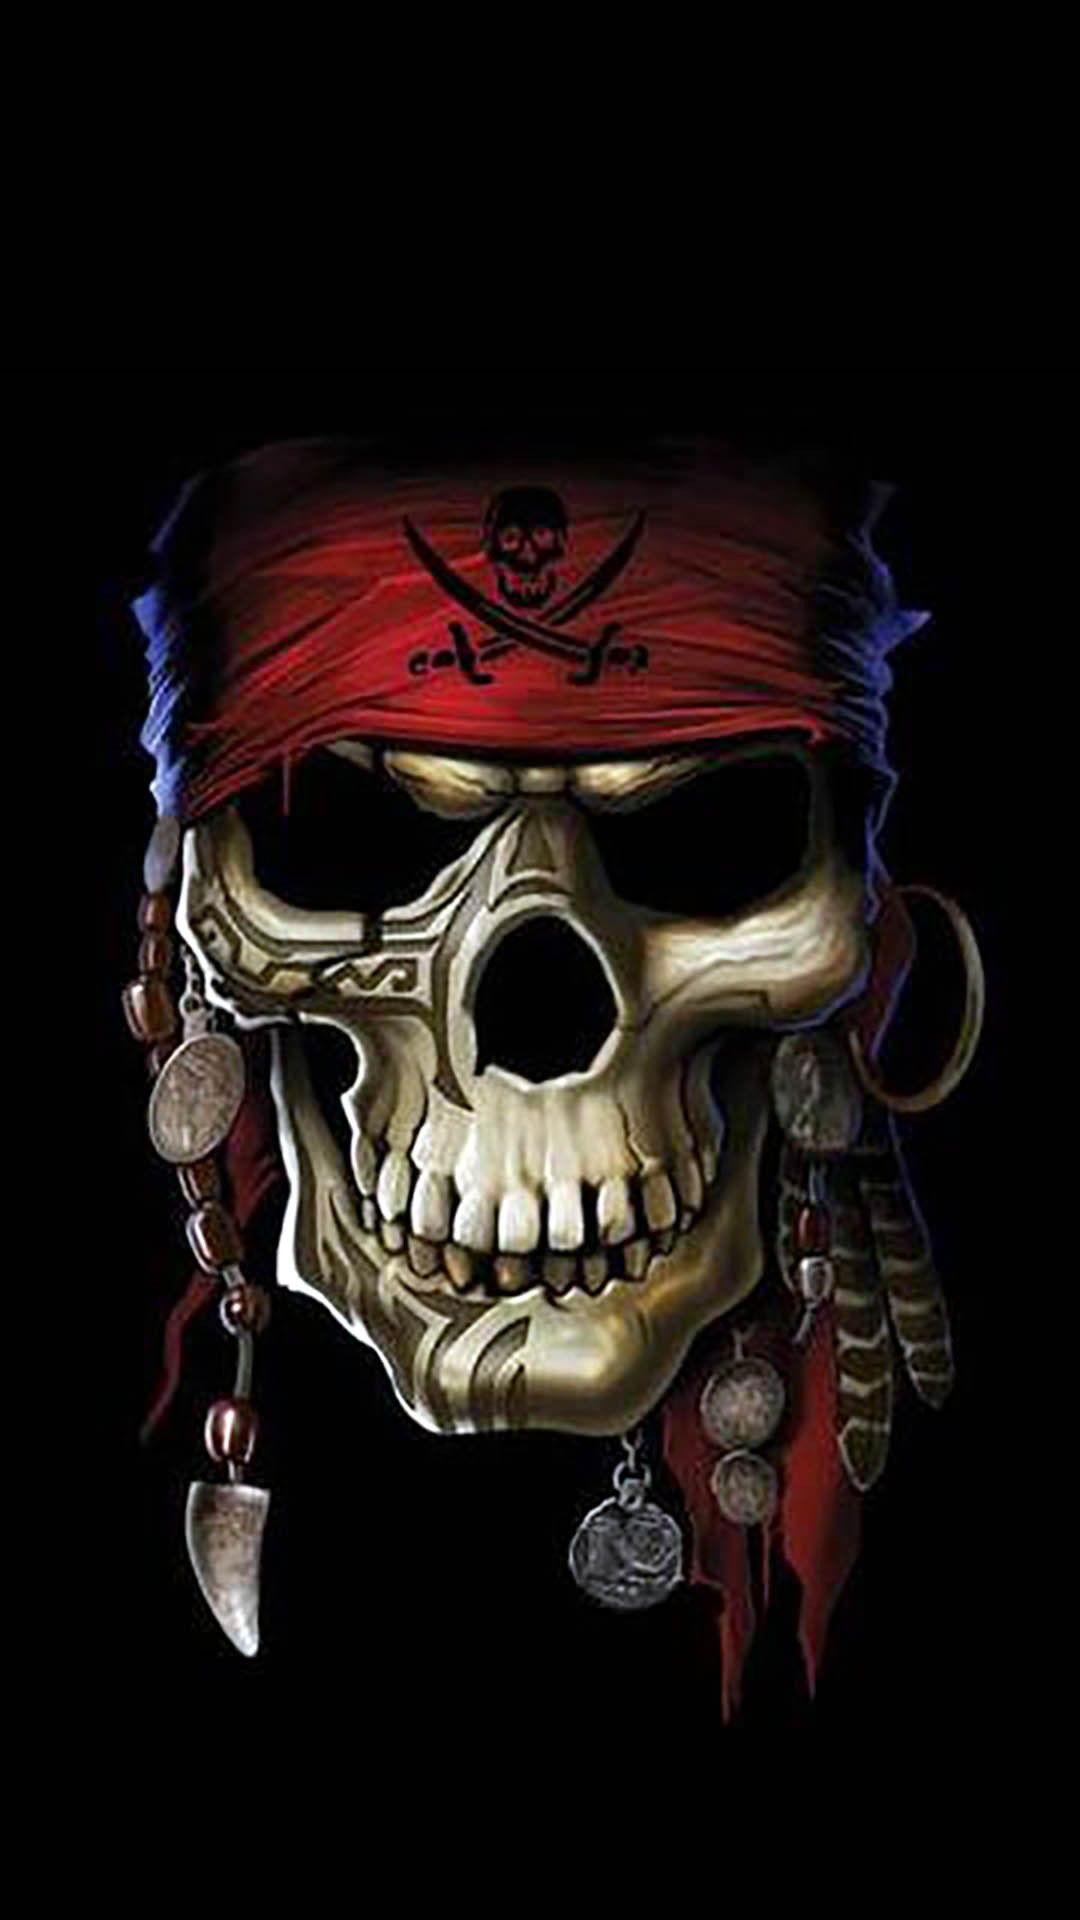 Pin De Karmen En Tatuajes Tatuaje Pirata Calavera Pirata